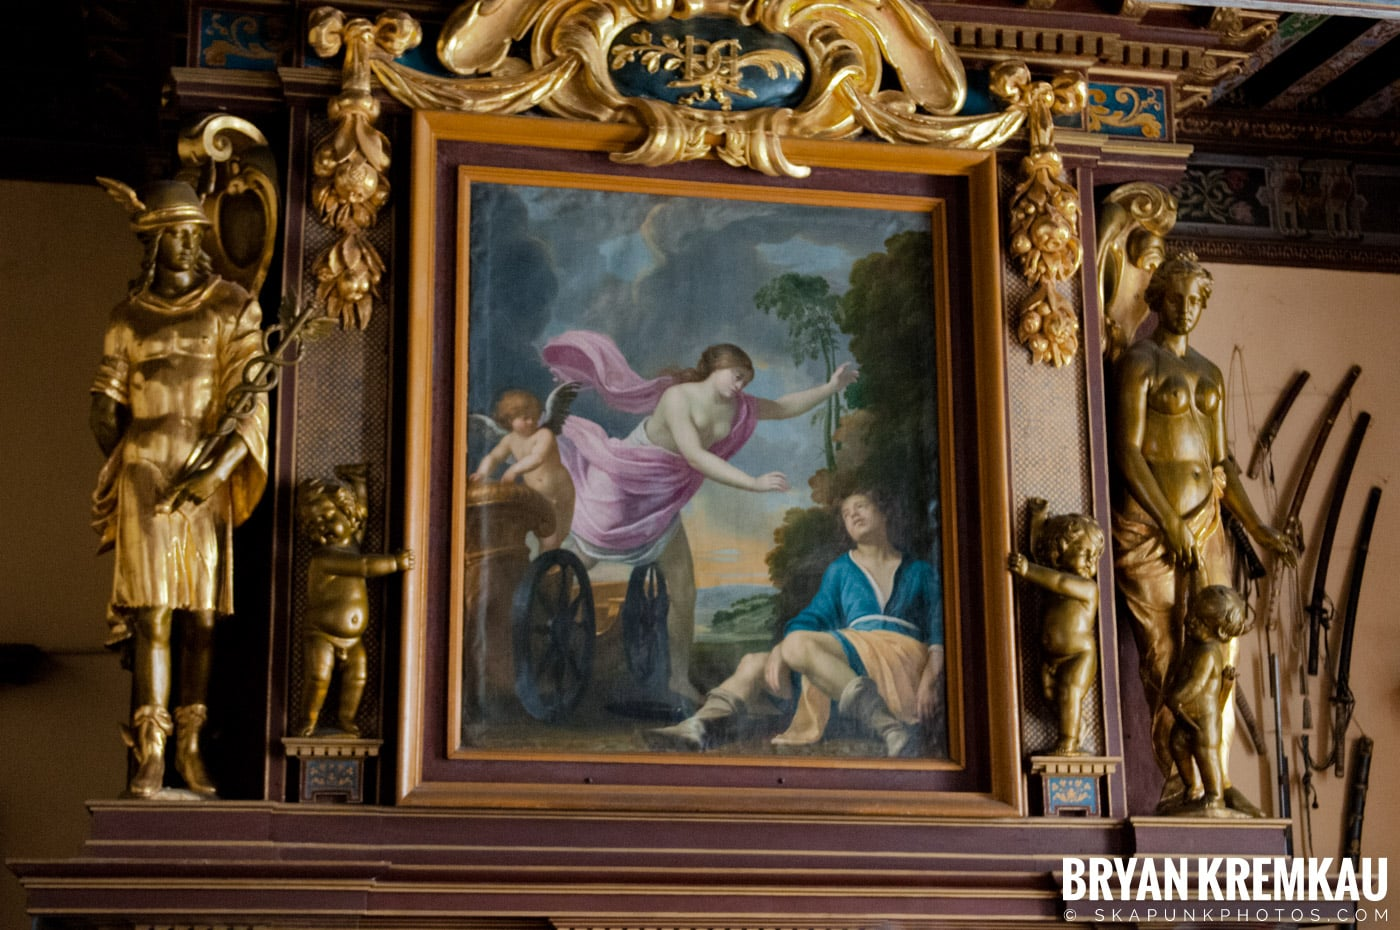 Paris, France Honeymoon - Day 7 - 7.24.11 (17)